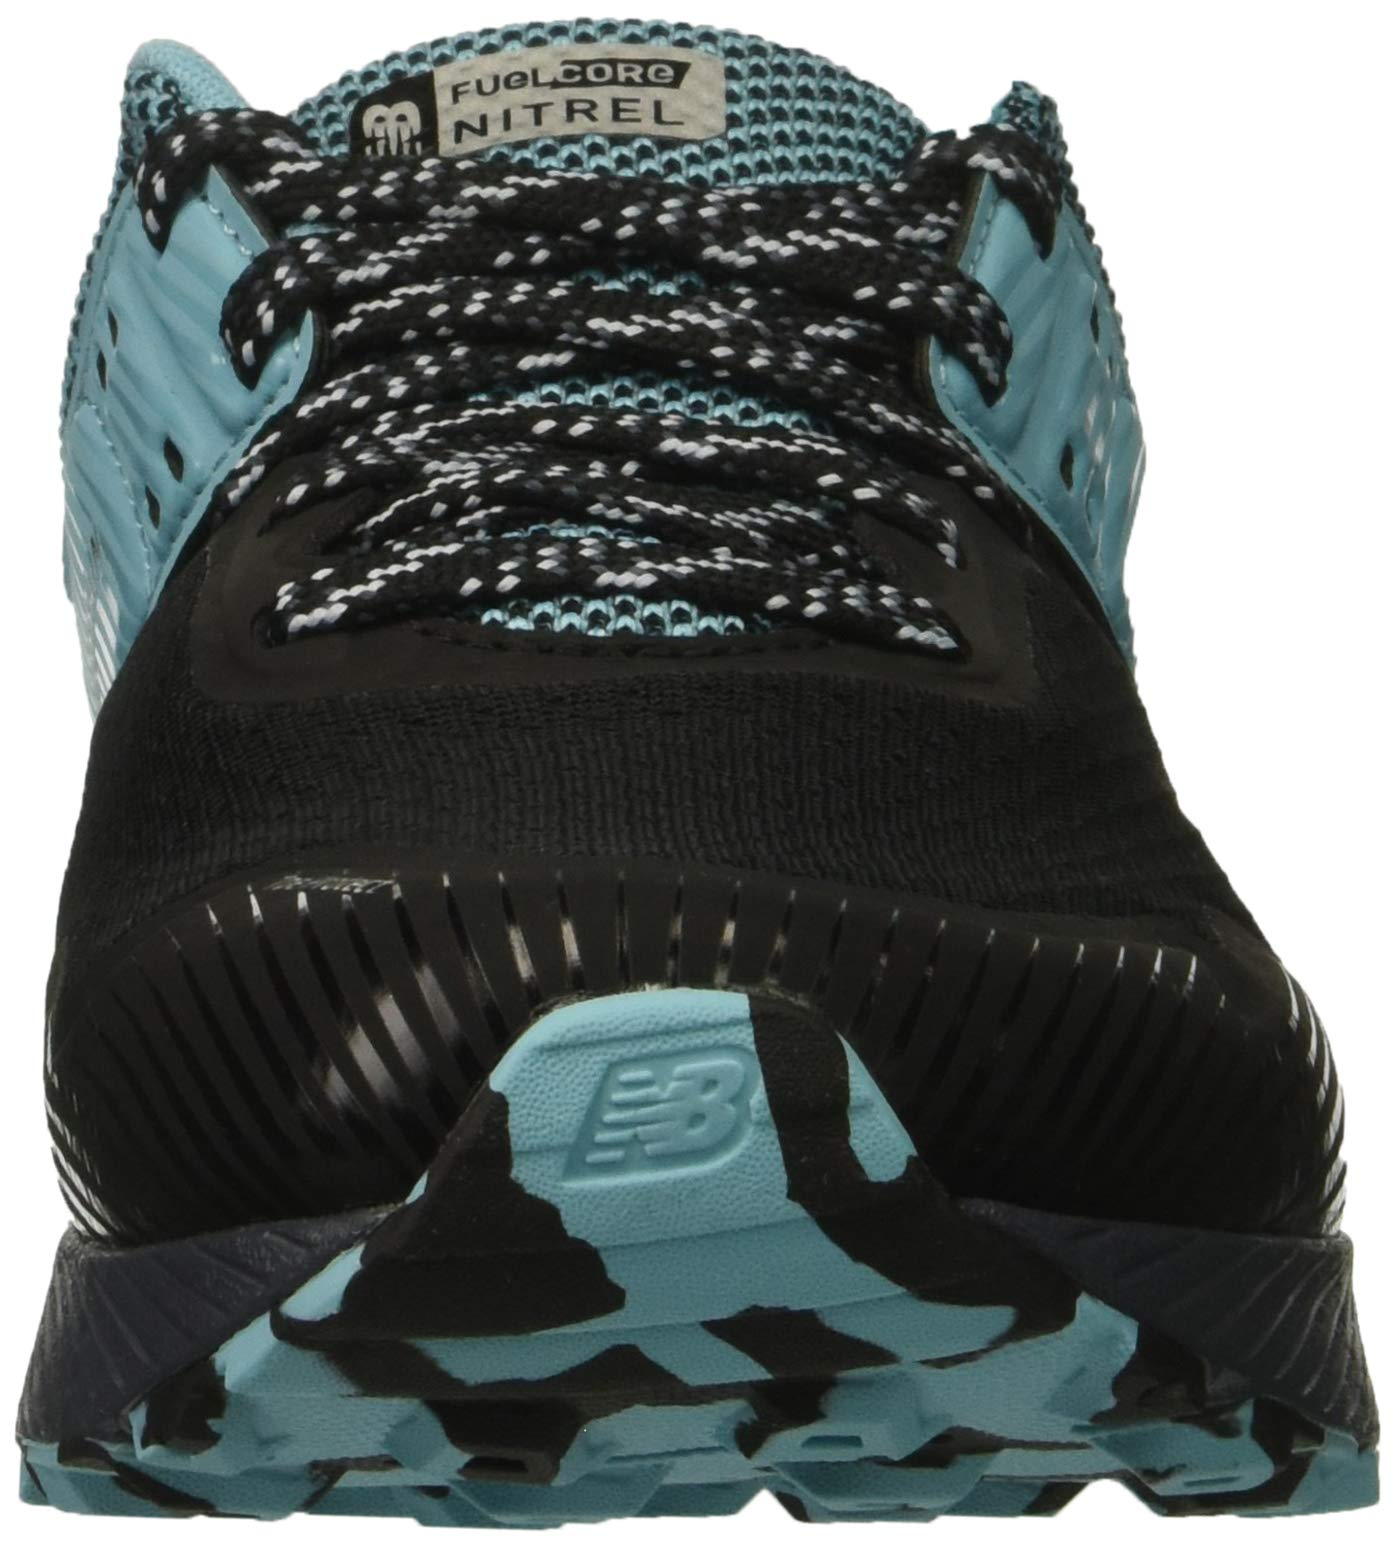 New Balance Women's Nitrel V2 FuelCore Trail Running Shoe Black/Thunder/Enamel Blue 5.5 B US by New Balance (Image #4)